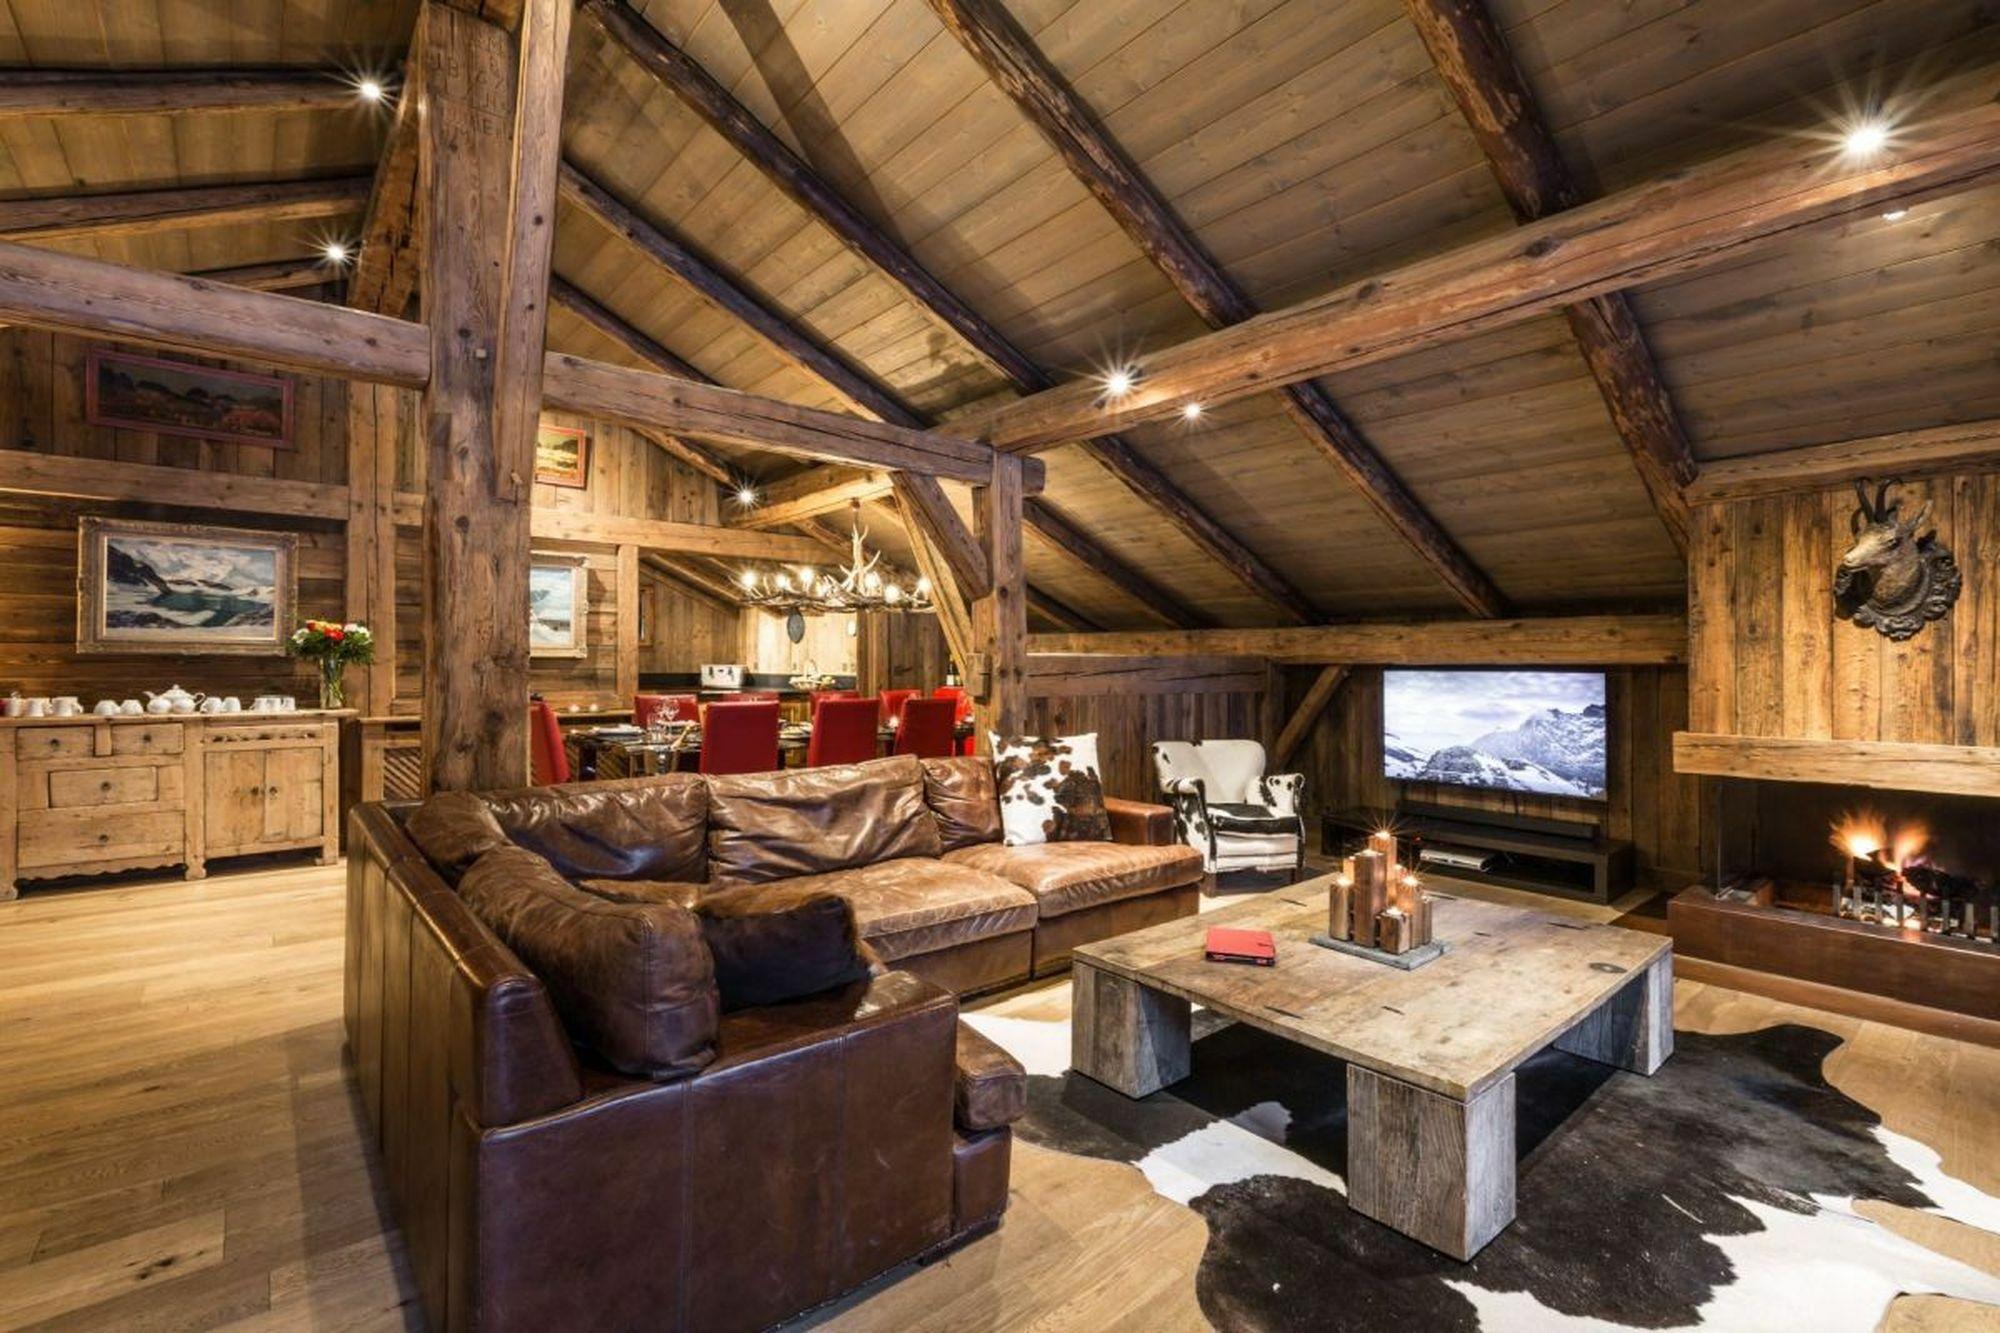 Baloo Accommodation in Chamonix